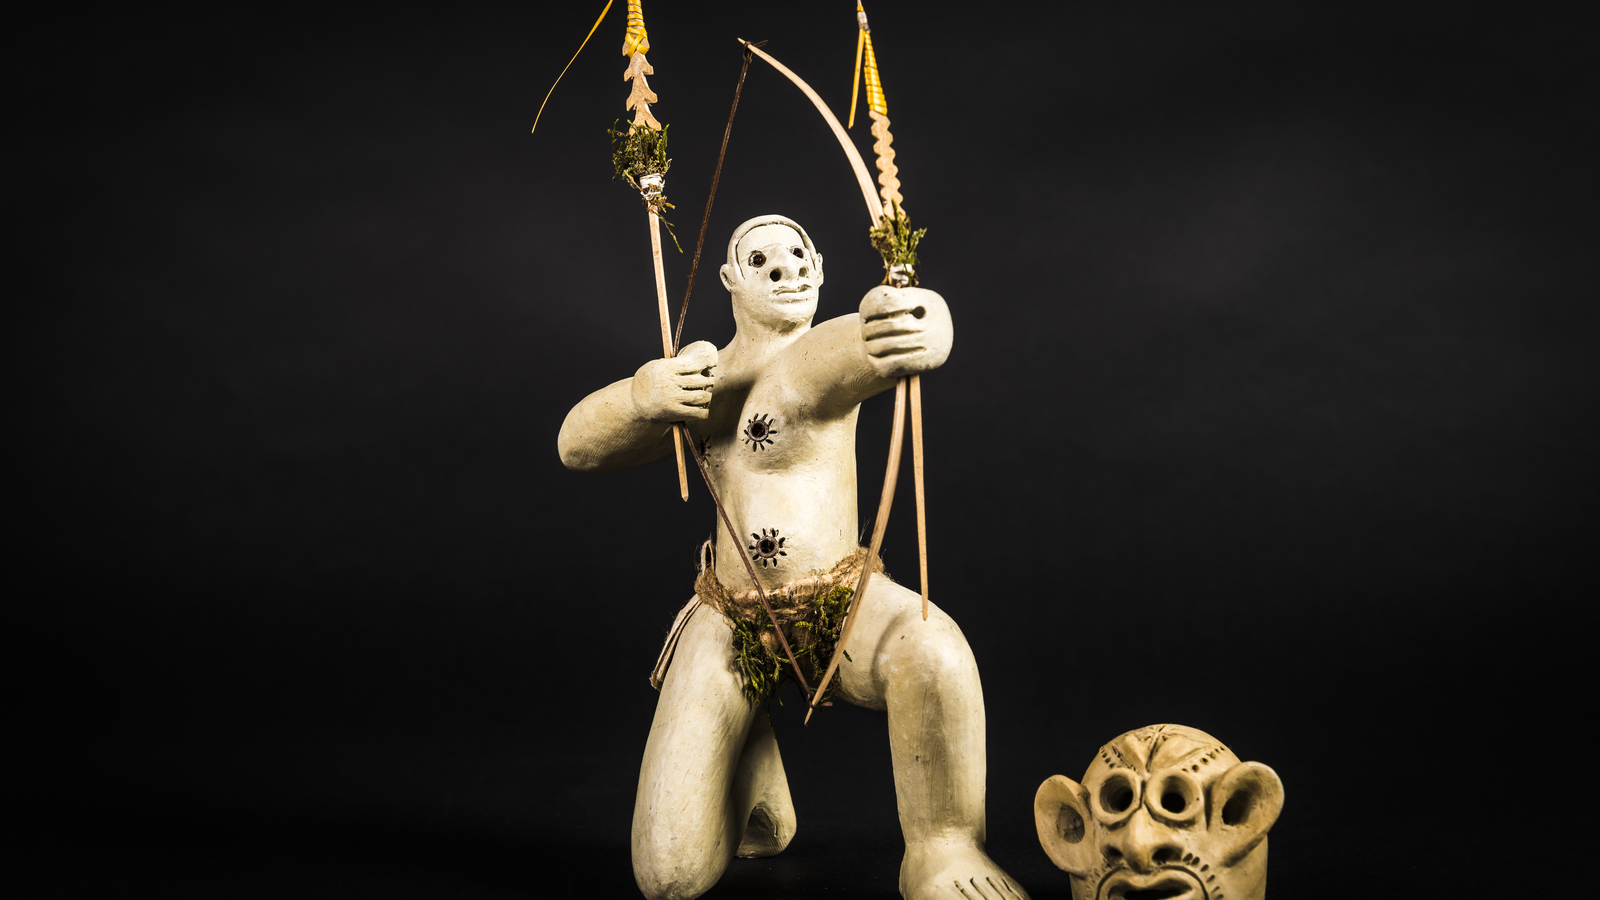 Asaro Figurines